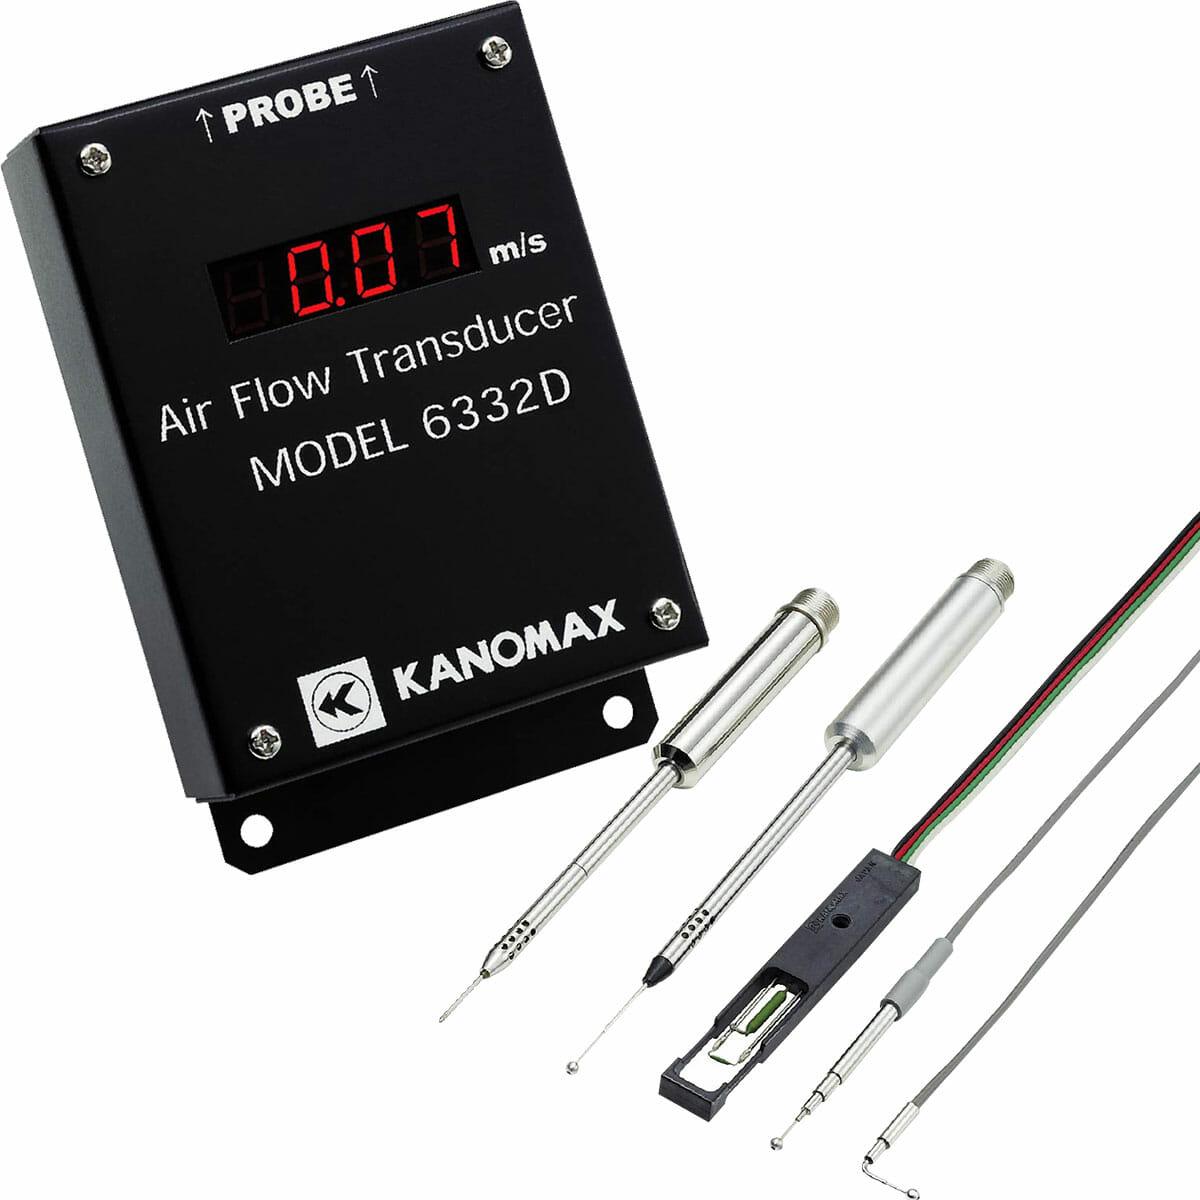 Kanomax Airflow Transducer - Models 6332/6332D